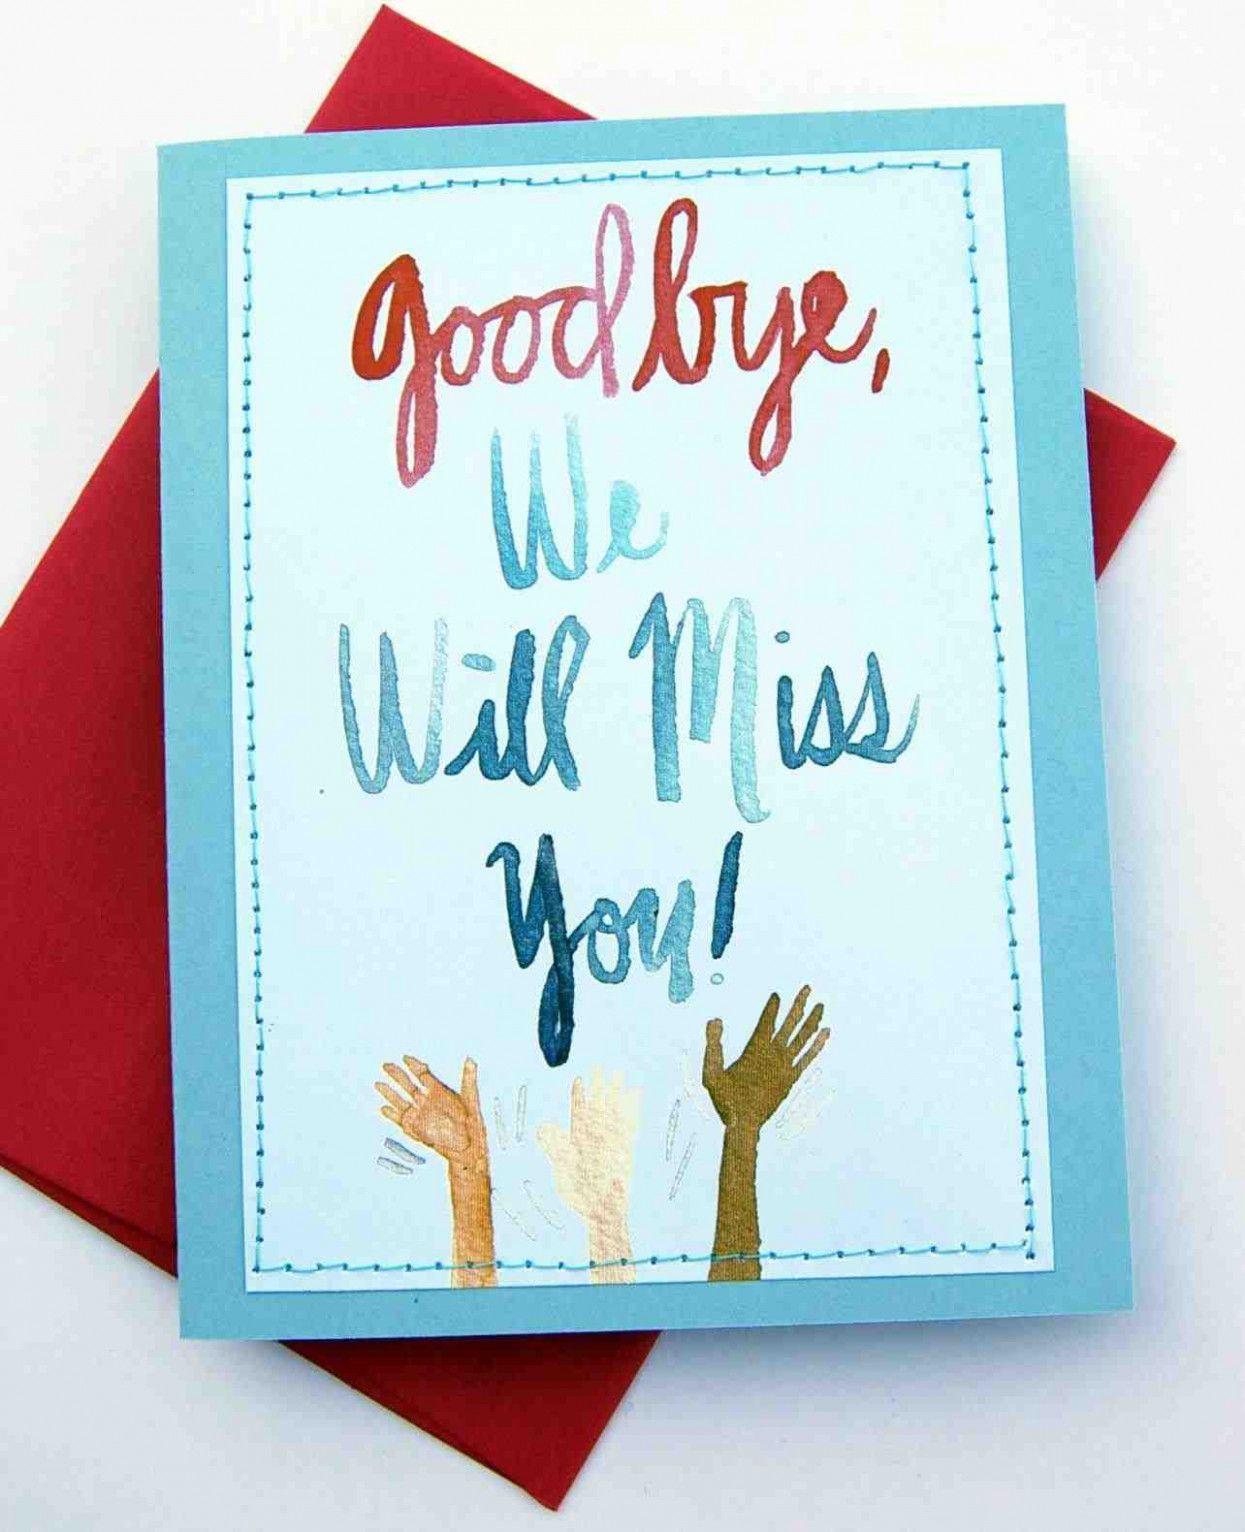 Farewell Card Message For Boss in 4  Card design handmade